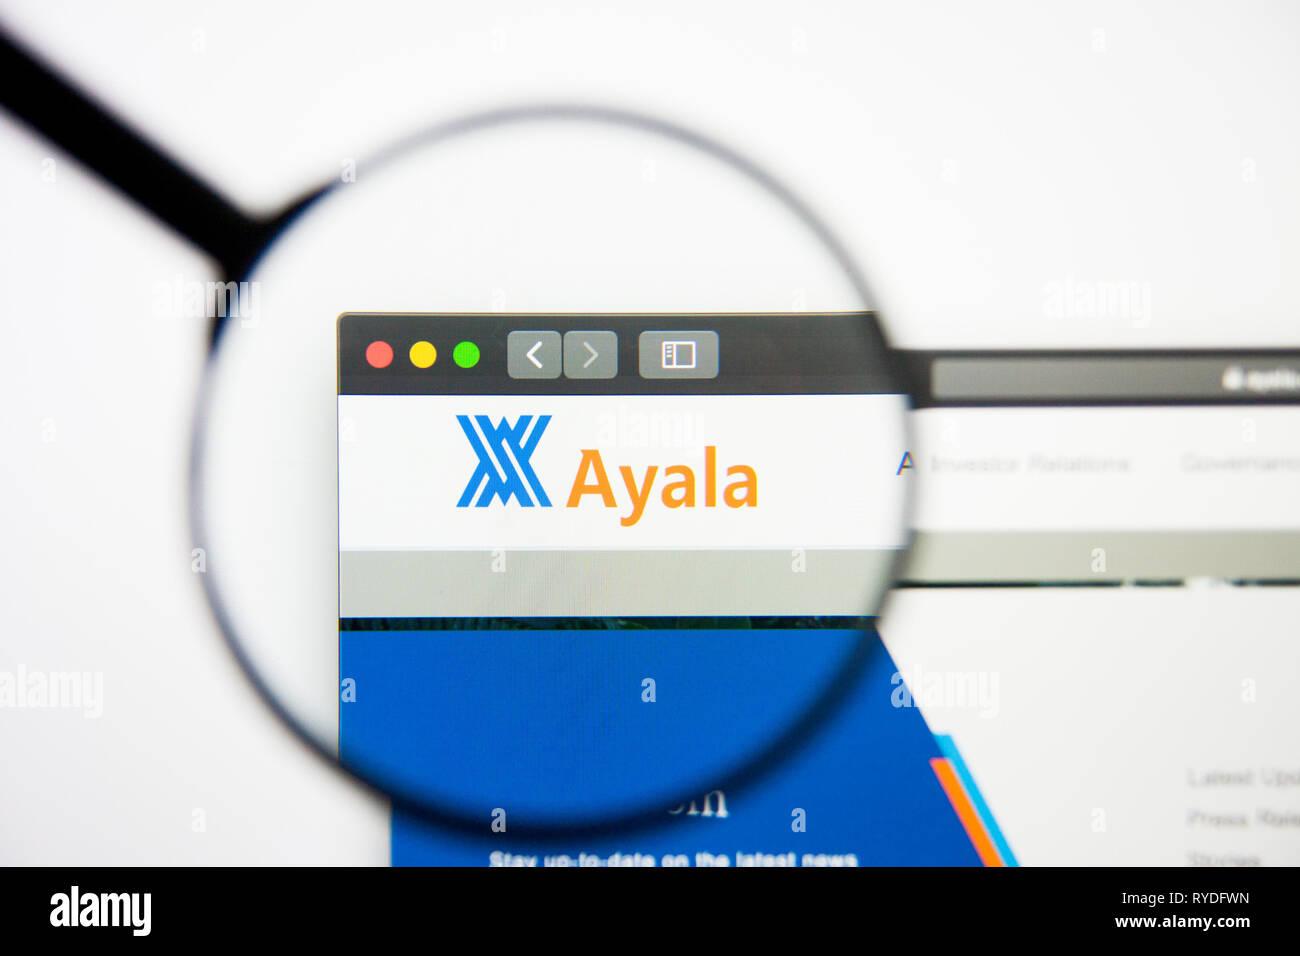 Los Angeles, California, USA - 5 March 2019: Ayala website homepage. Ayala logo visible on display screen, Illustrative Editorial - Stock Image